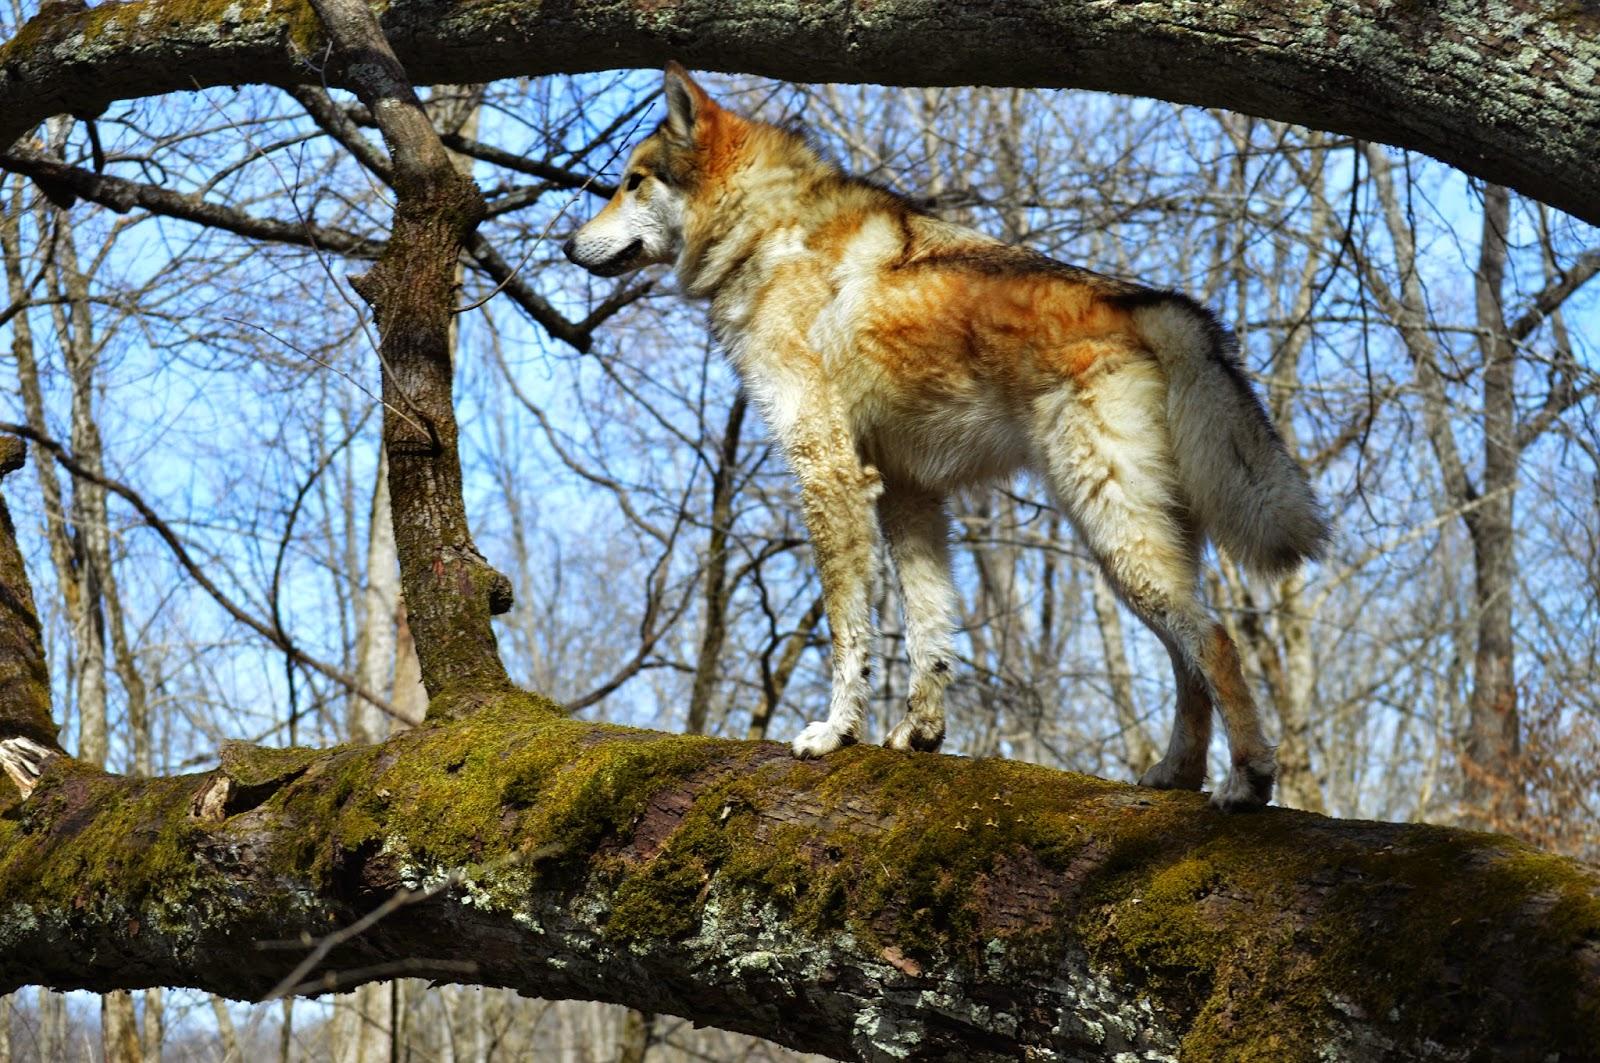 wolfdog climbing tree, wolf hybrid climbing tree